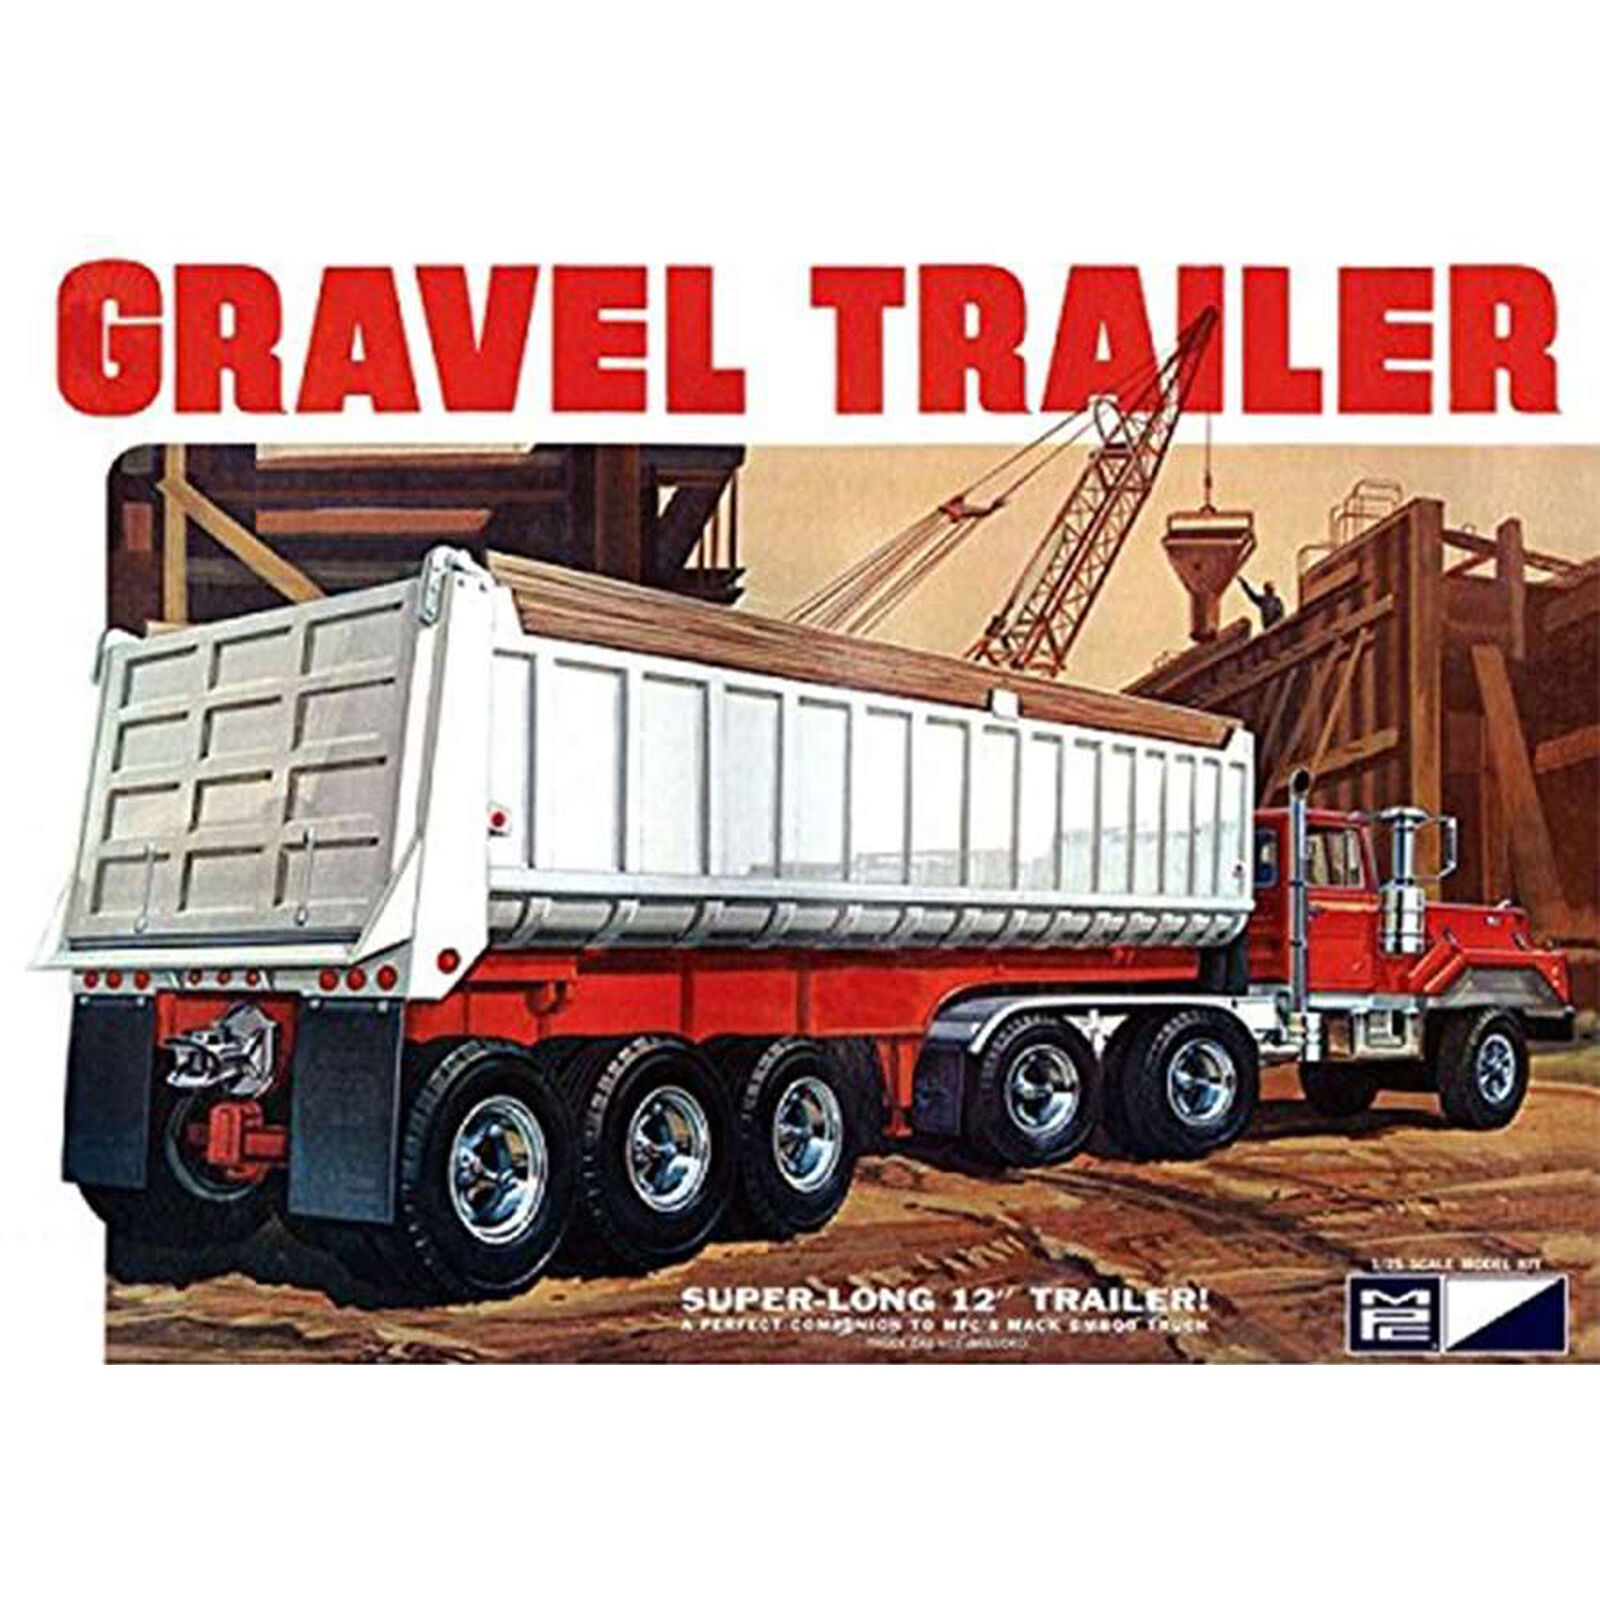 1/25 3 Axle Gravel Trailer